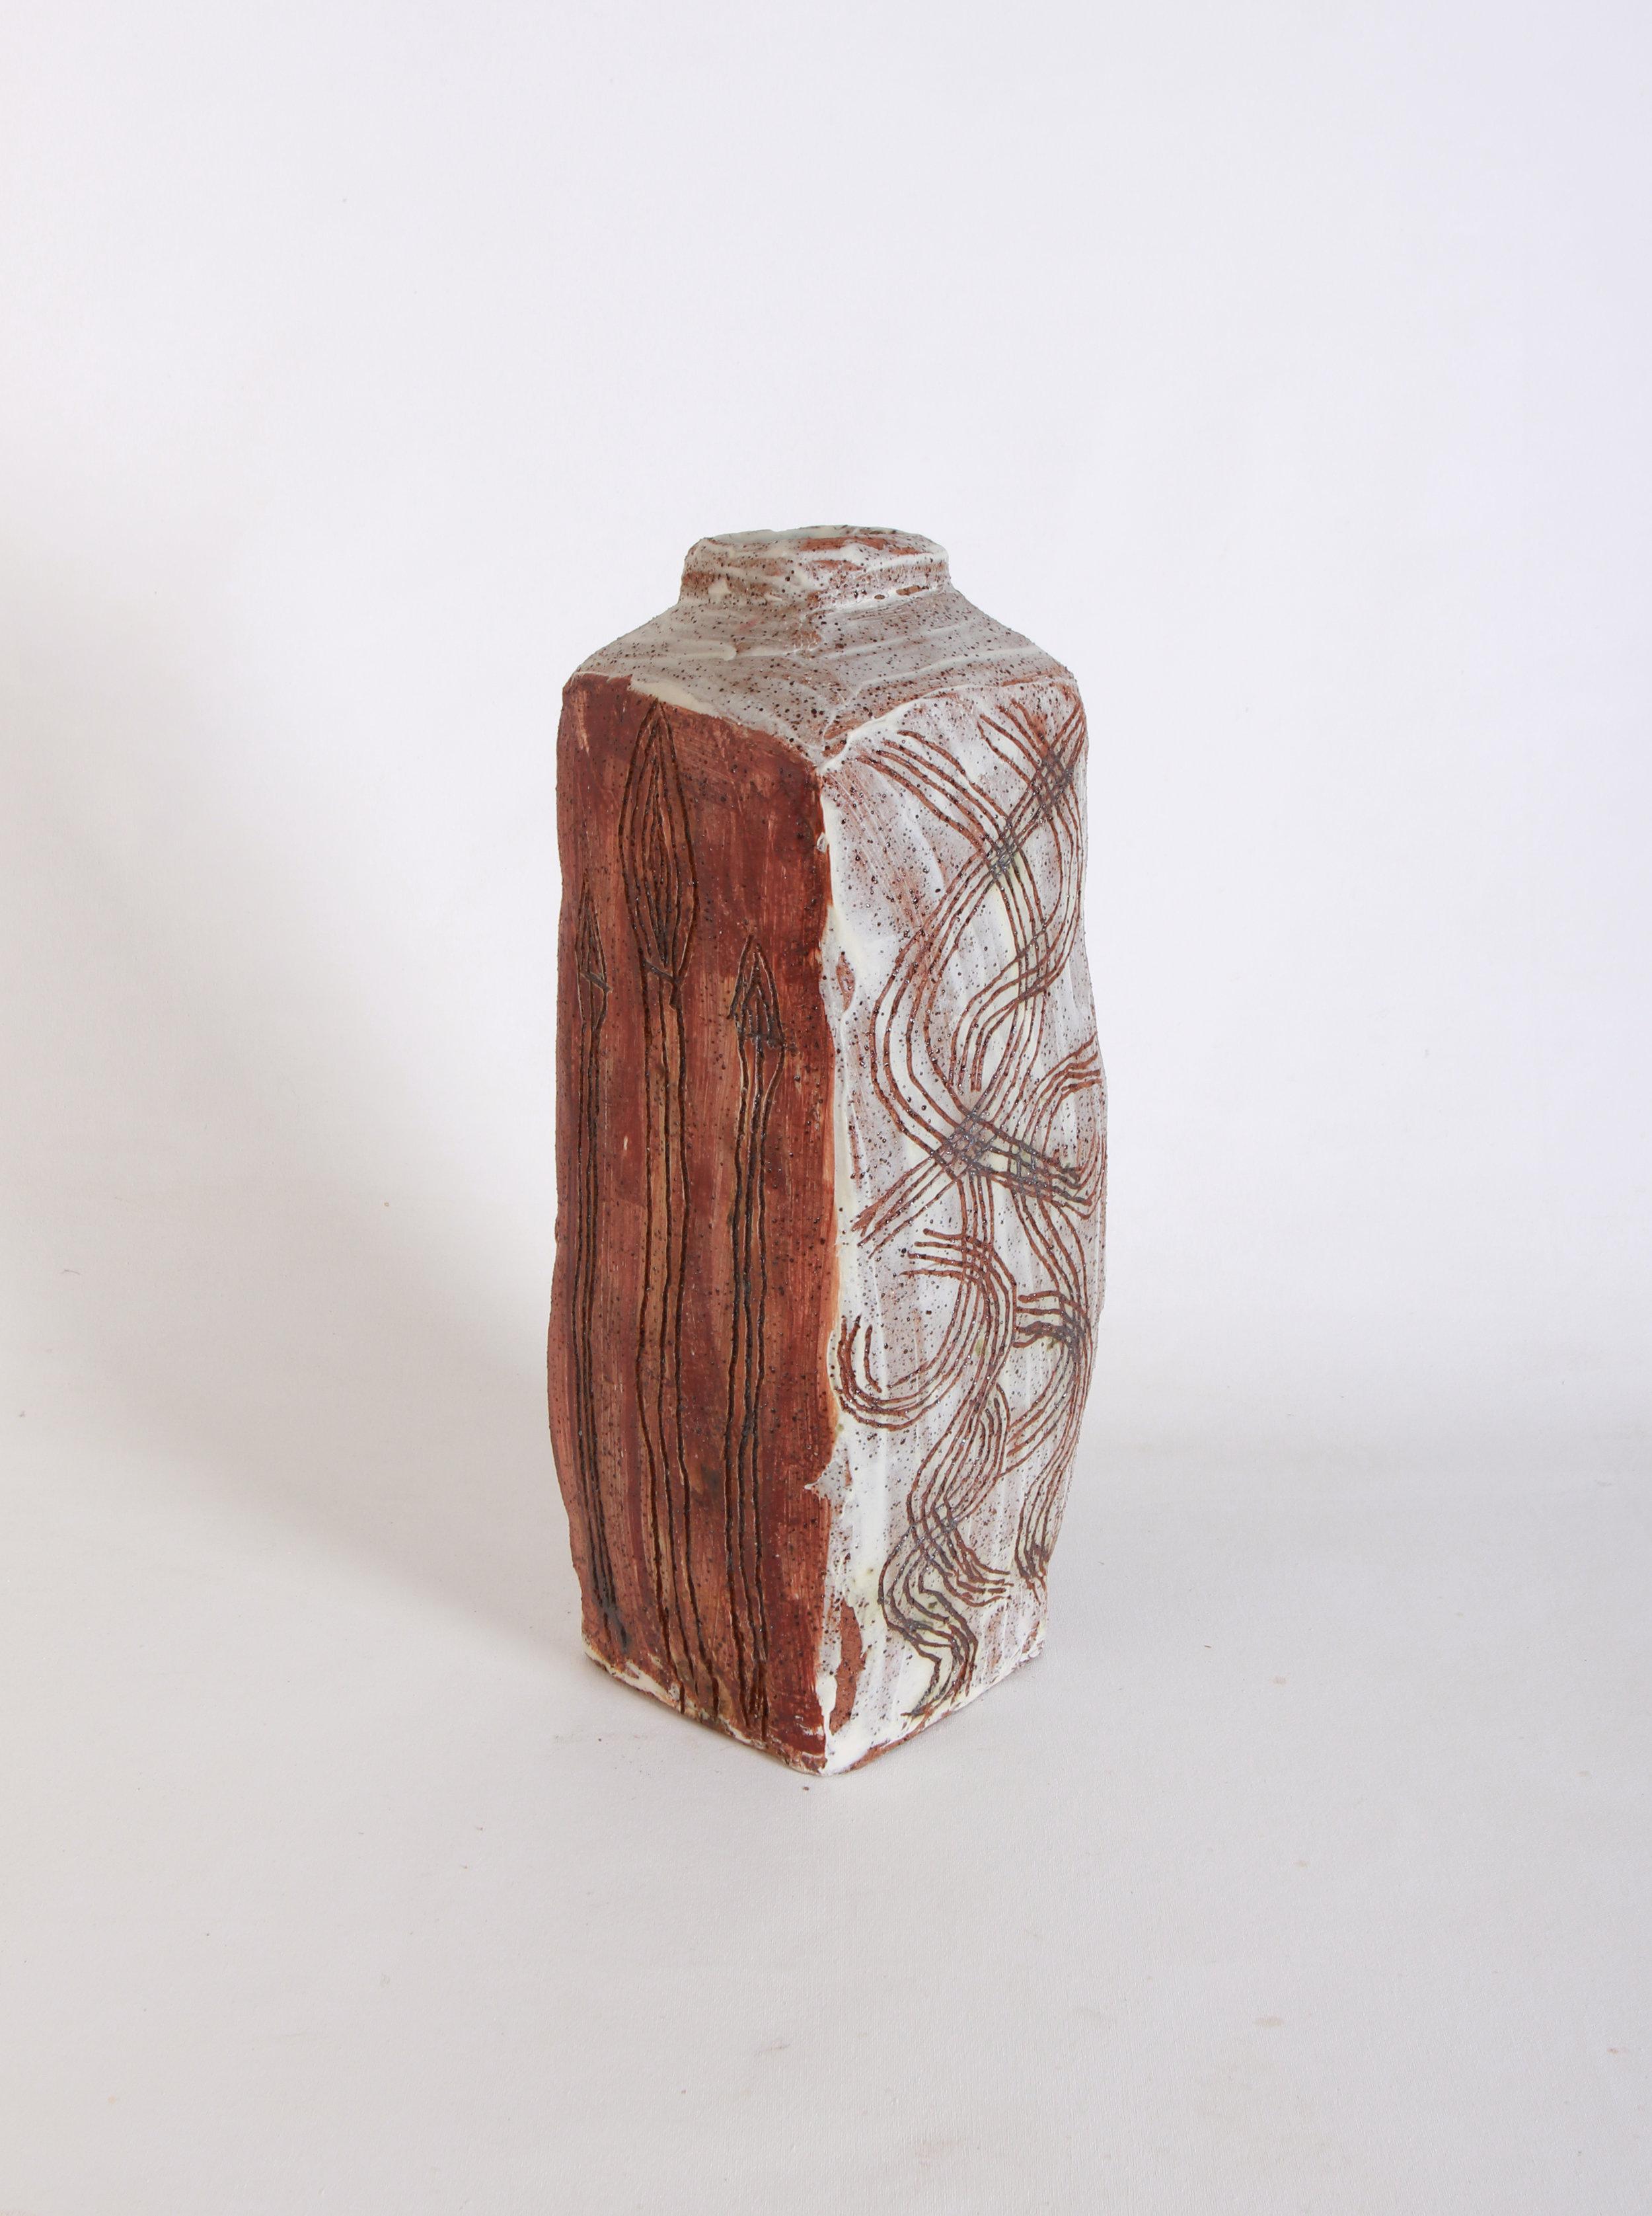 RUPERT JACK  Kulata Tjuta Munu Maku Tjukurpa, 2017  430H x 210mm Stoneware Catalog #258C-17    EMAIL INQUIRY